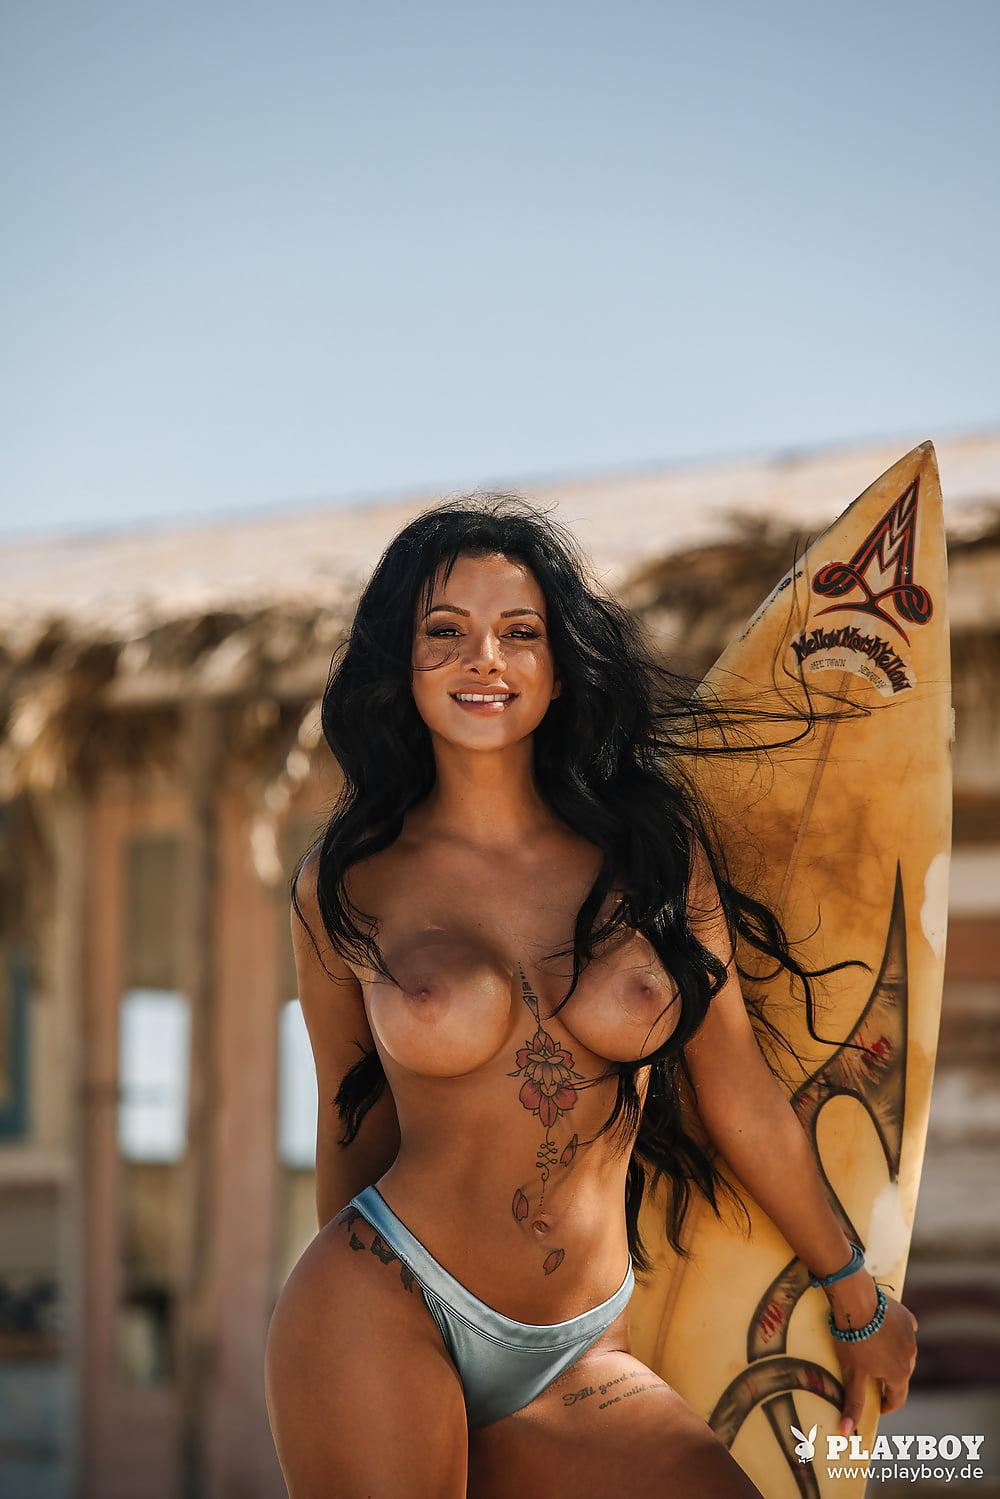 Nackt bilder mihailova emilija Emilija Mihailova